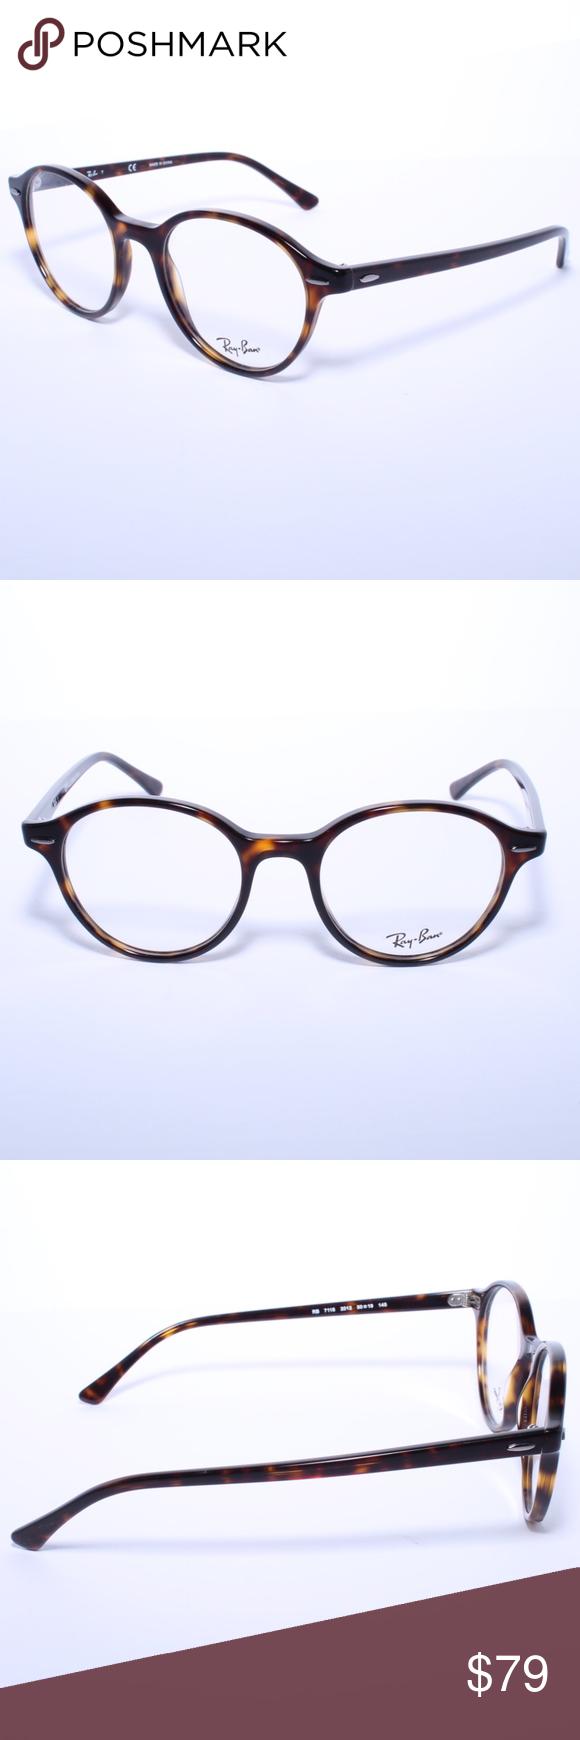 41dae0a8596b4 Ray-Ban Ray Ban RB 7118 2012 50MM Havana Rx Tortoi Ray-Ban Ray Ban RB 7118  2012 50MM Unisex Eyeglasses Havana Rx Tortoise Brand New 100% Authentic  Comes ...